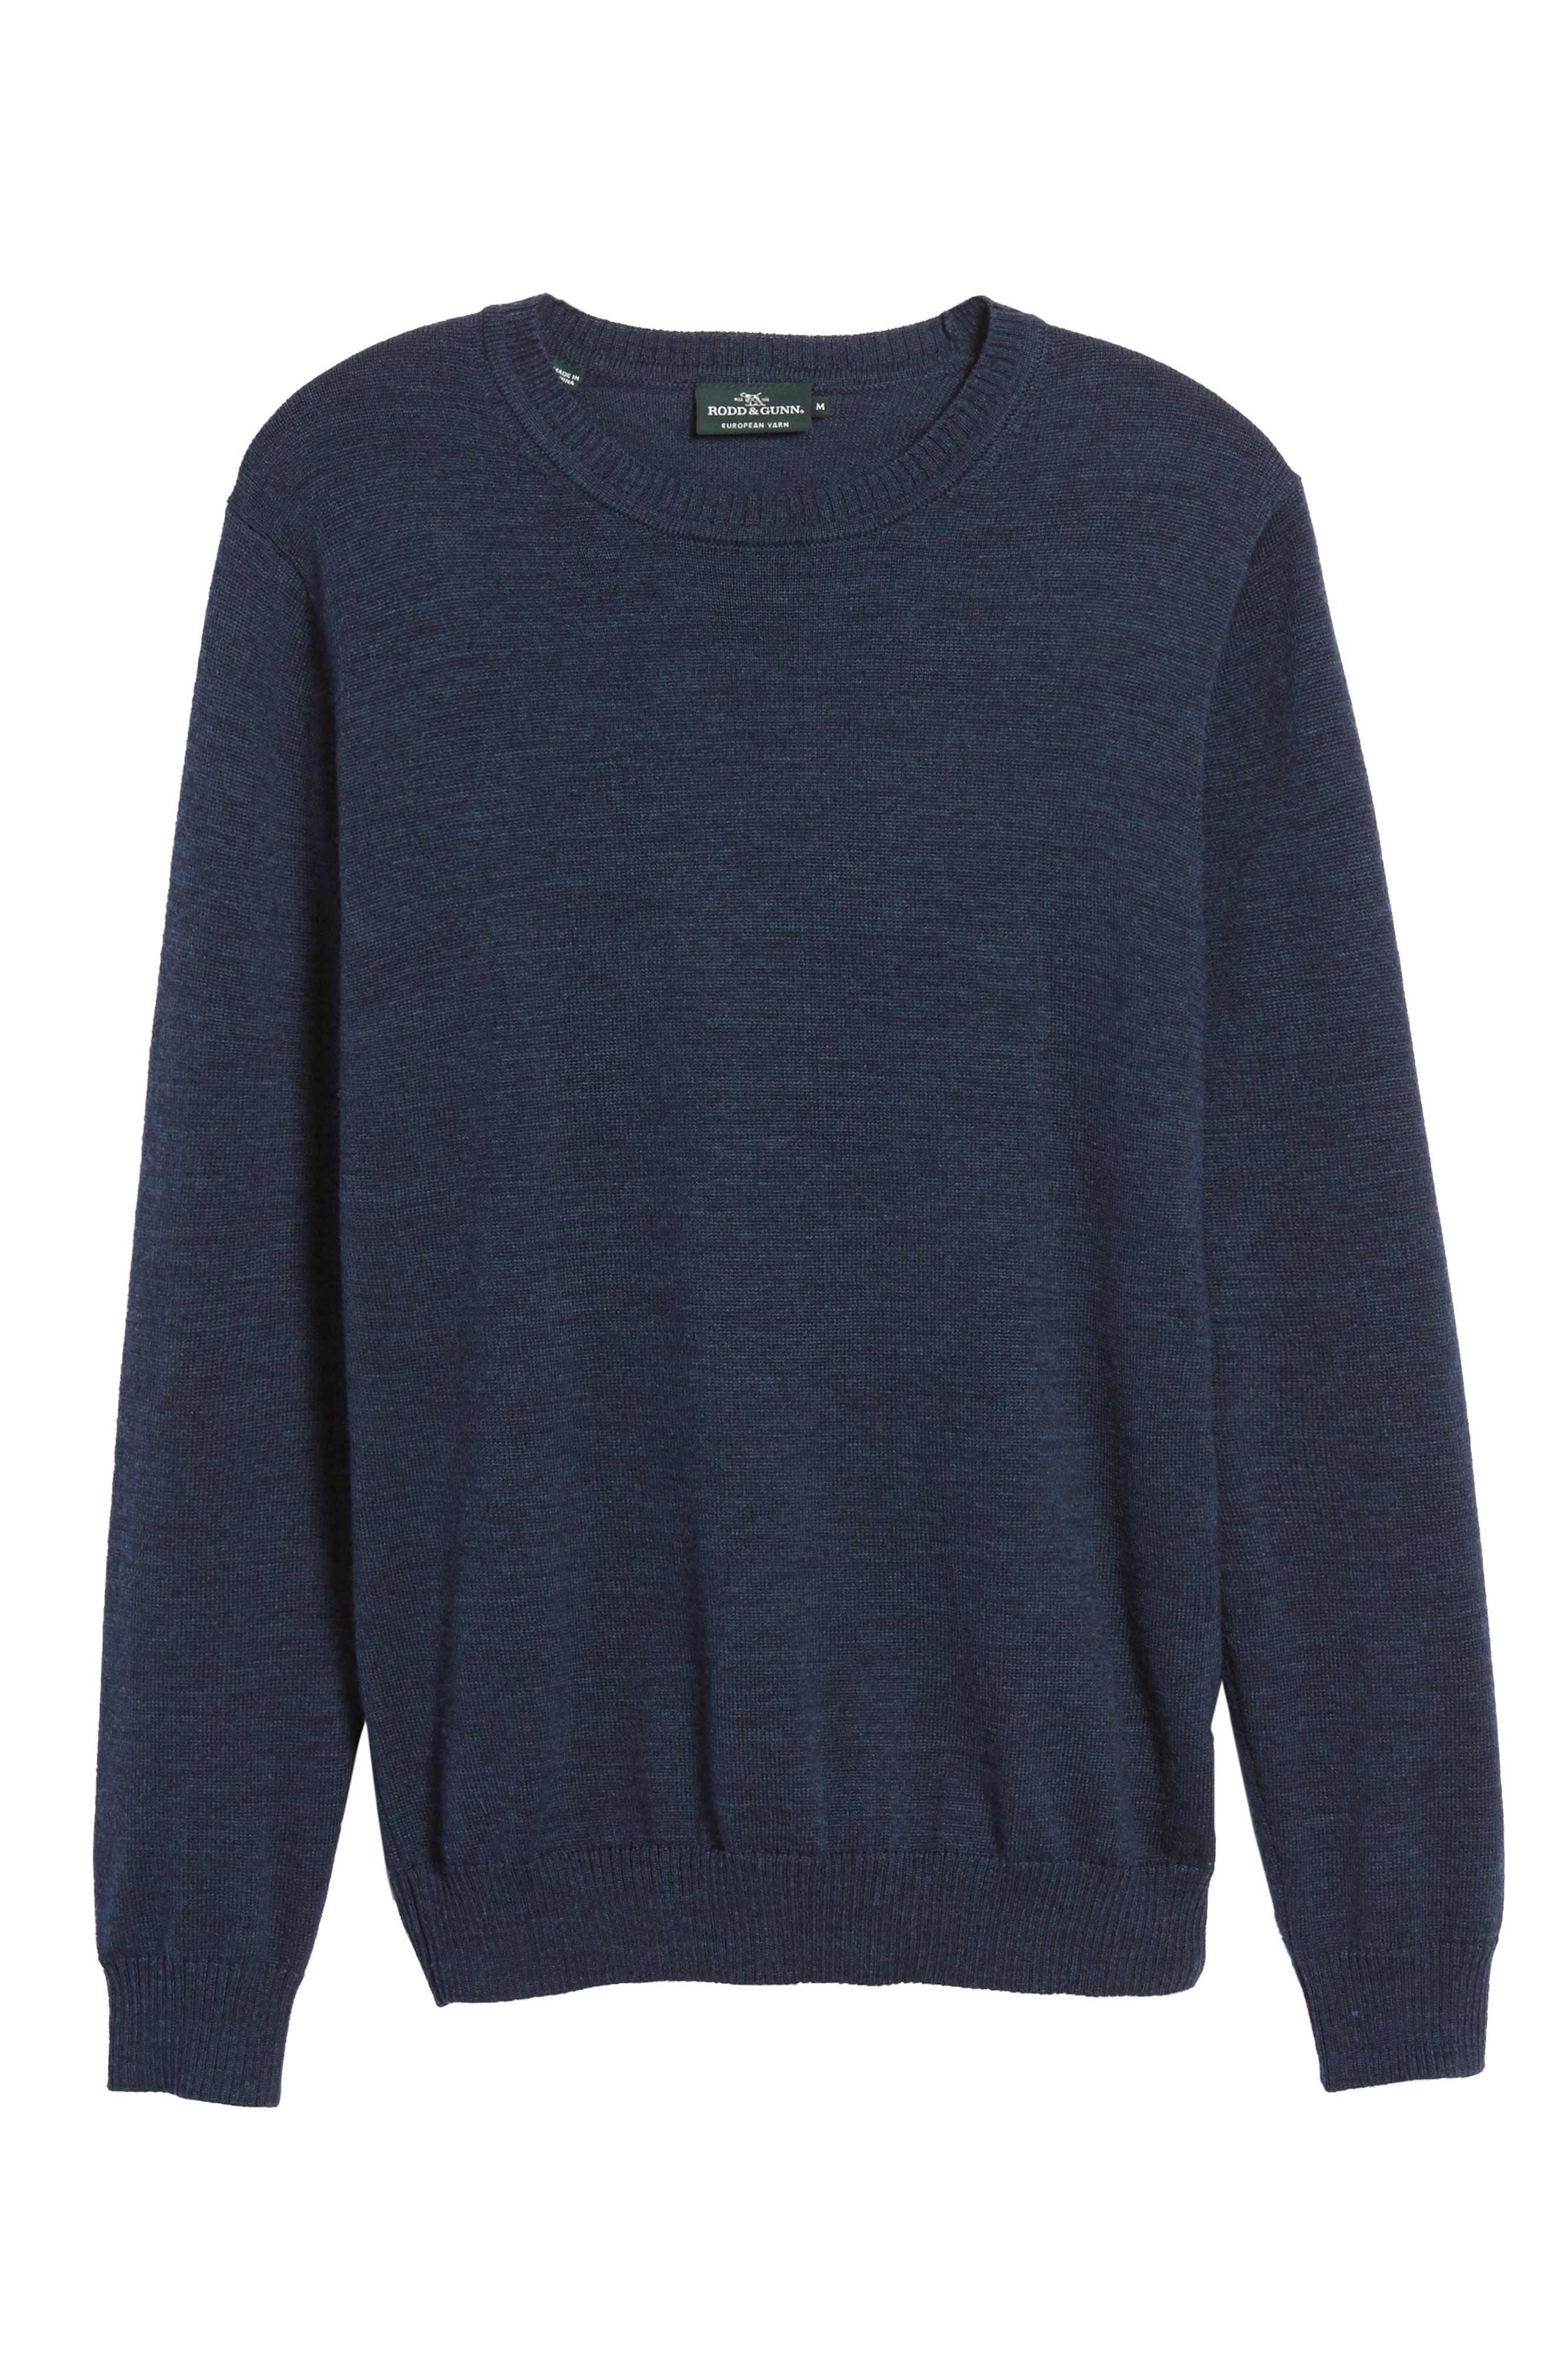 Bannockburn Mélange Merino Wool Sweater,                             Alternate thumbnail 6, color,                             401